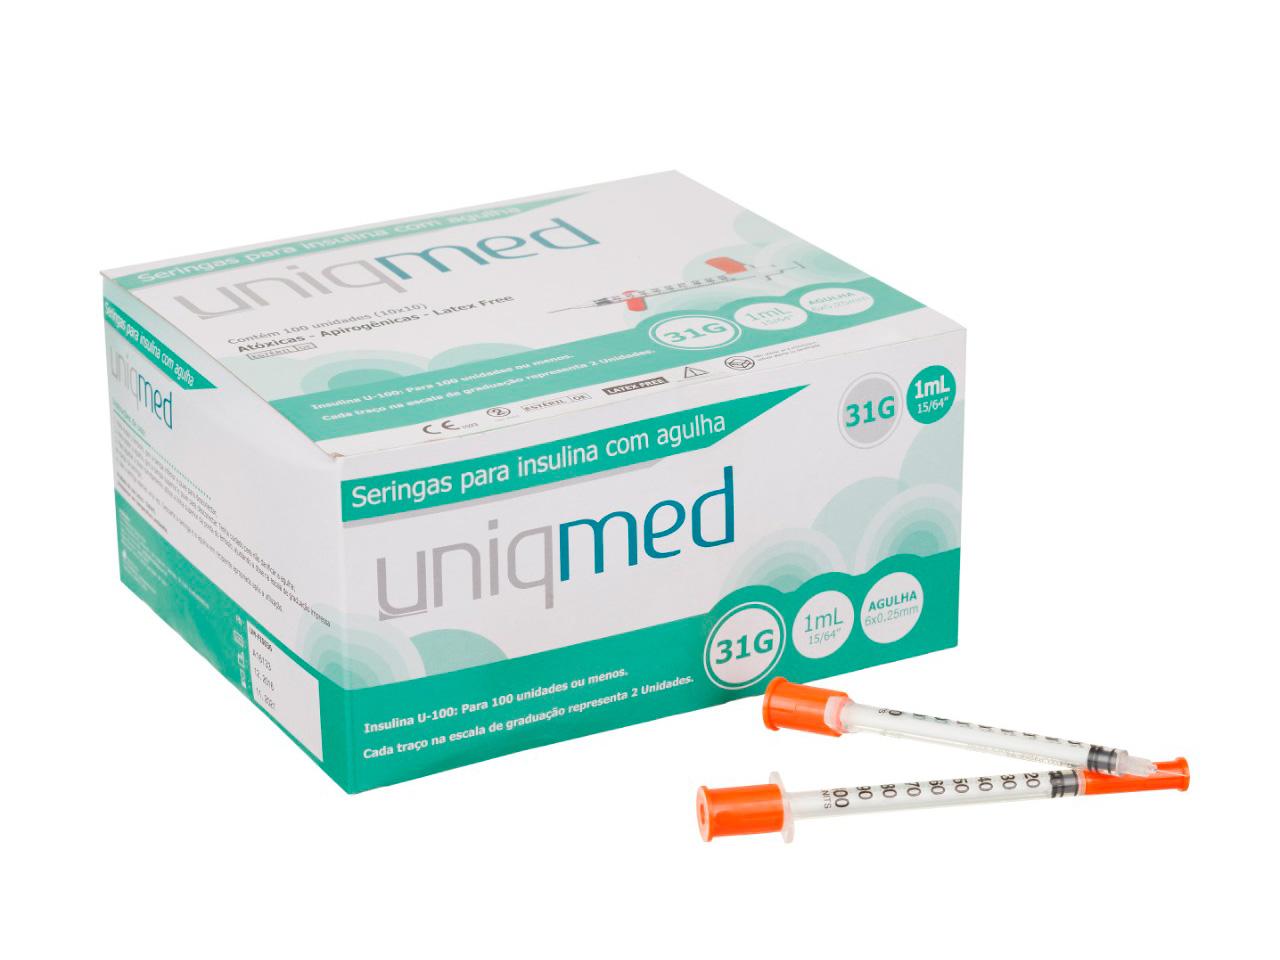 SERINGA 1,0 ml - 31 G - caixa 100 unidades